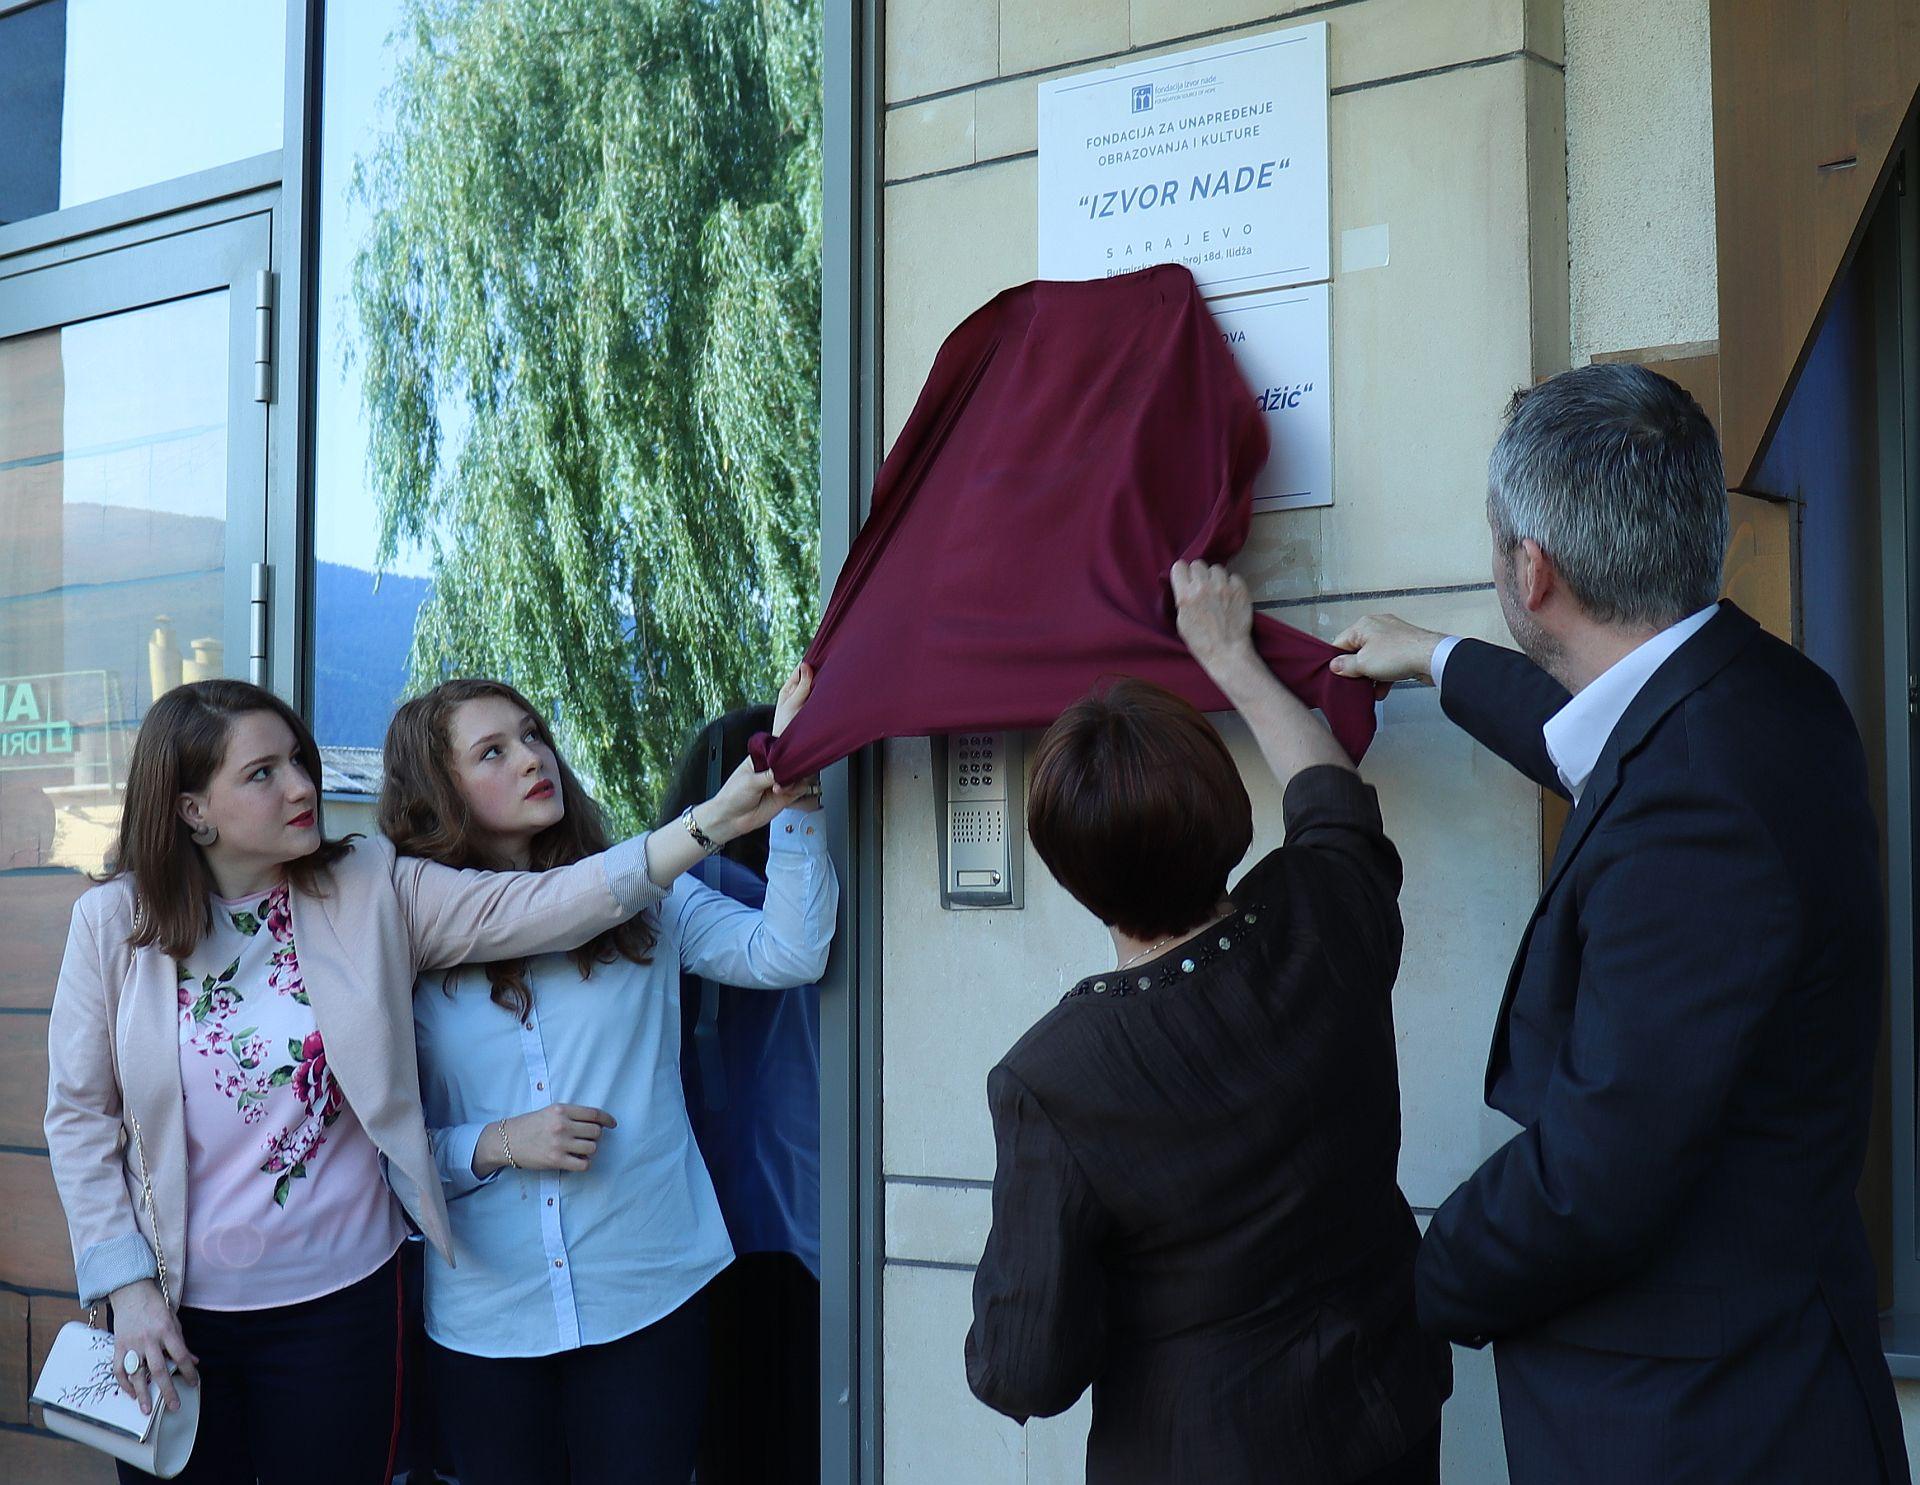 Stud. dom Prof. dr. Fikret Hadzic Sarajevo_o